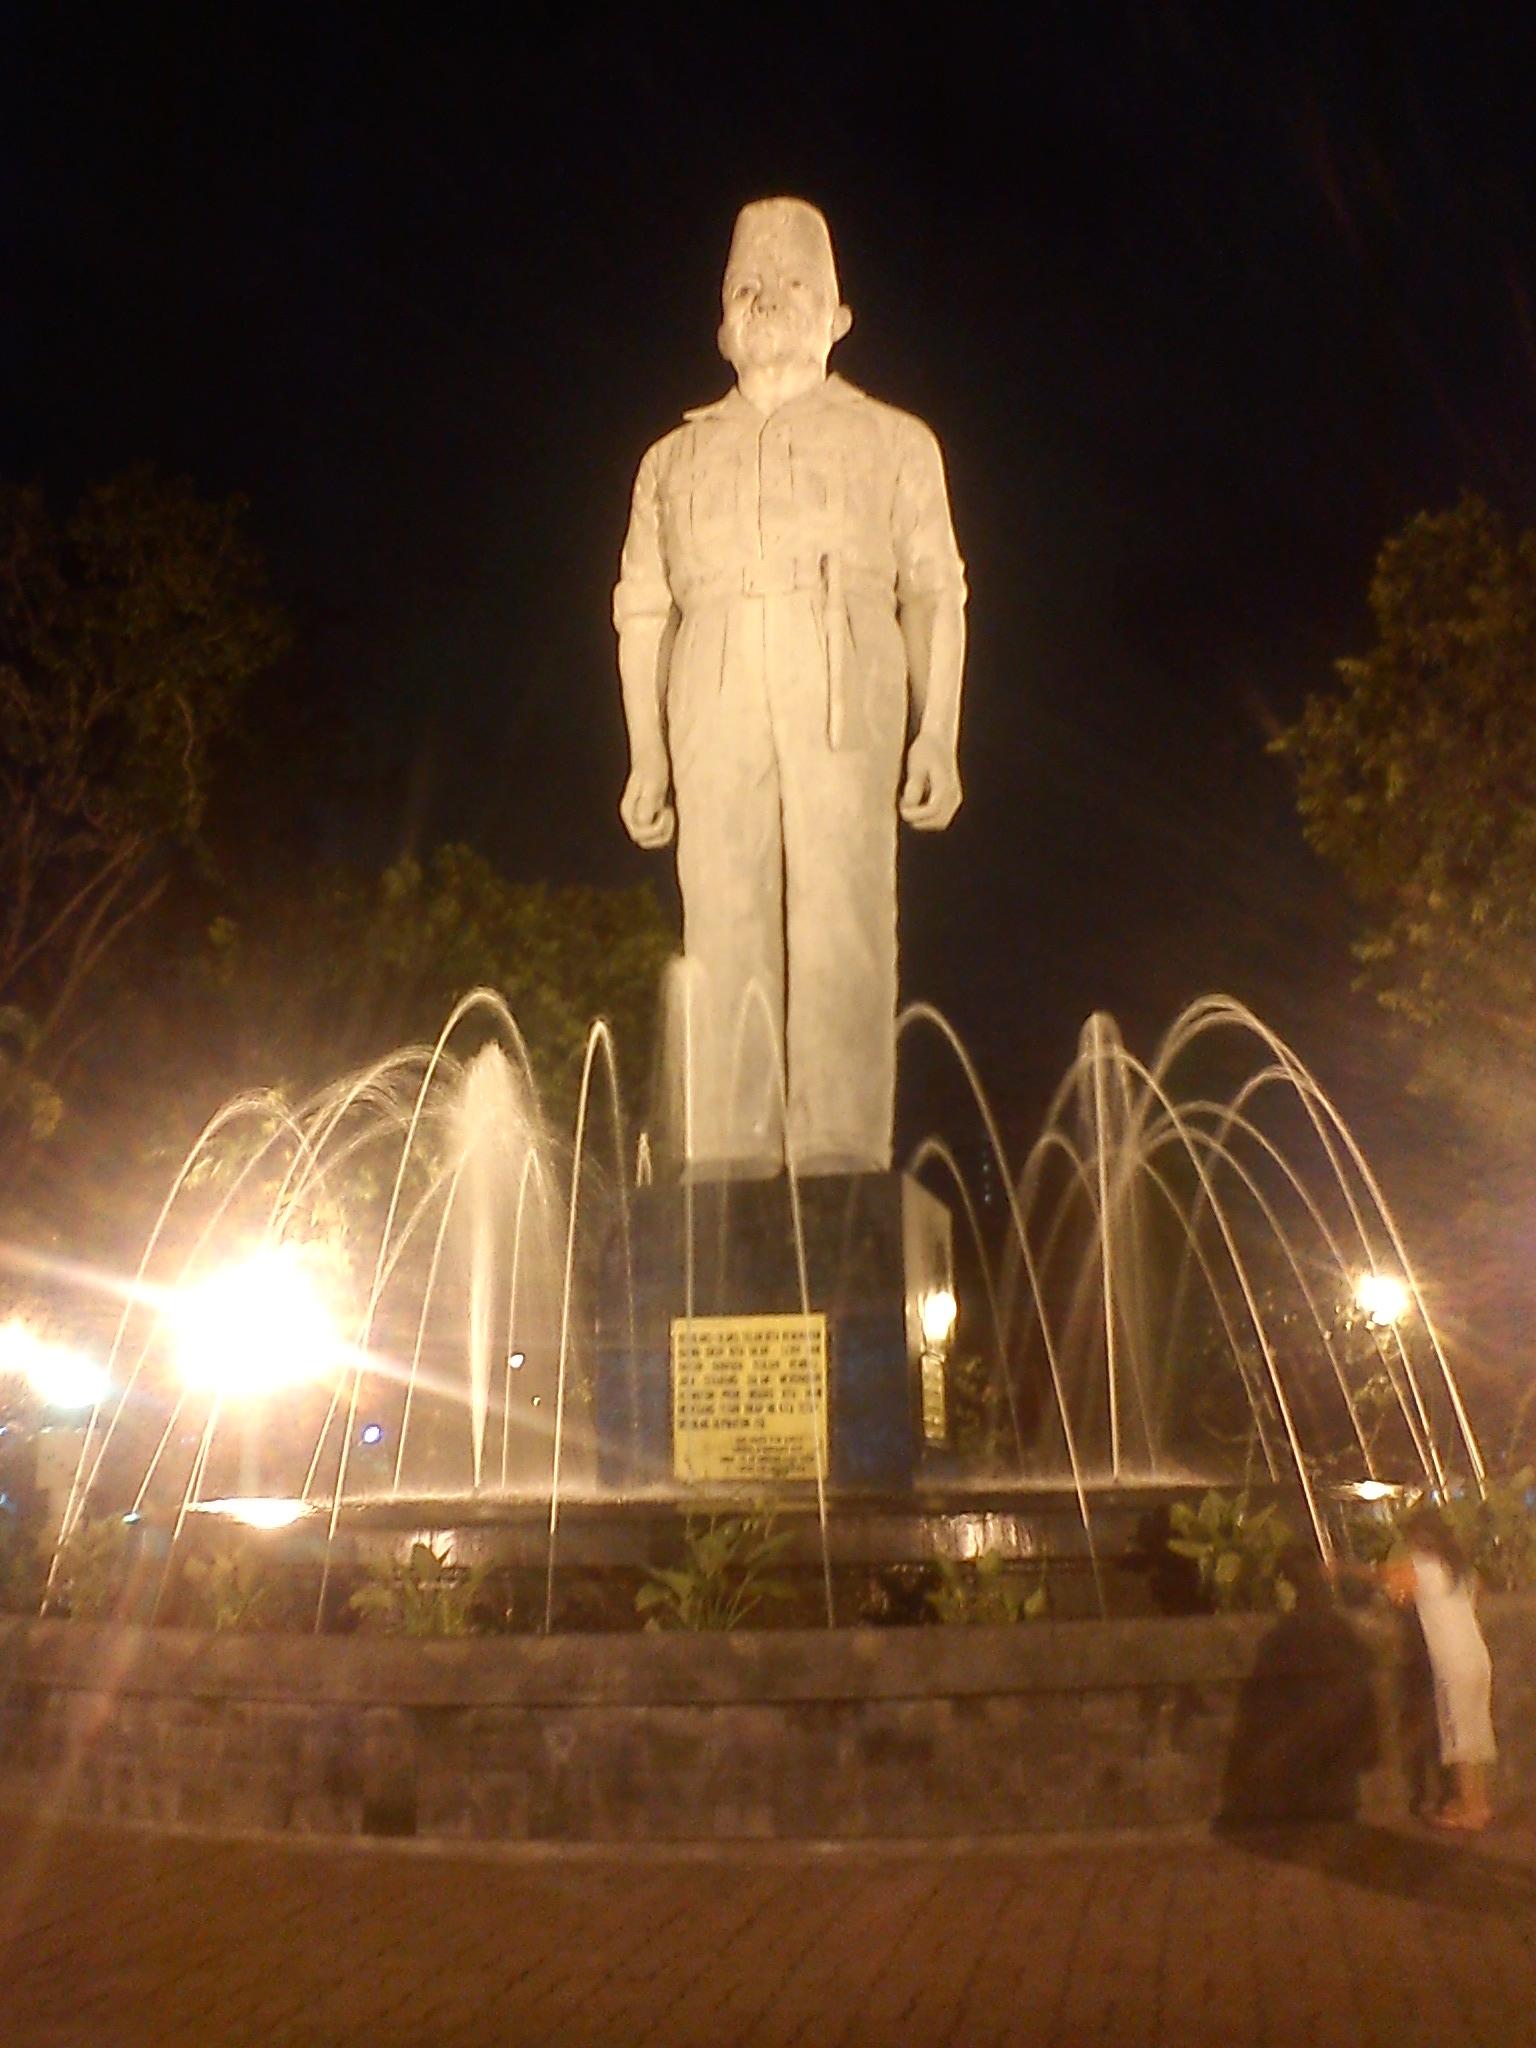 Menikmati Pesona Monumen Gubernur Suryo Arca Joko Dolog Taman Selama